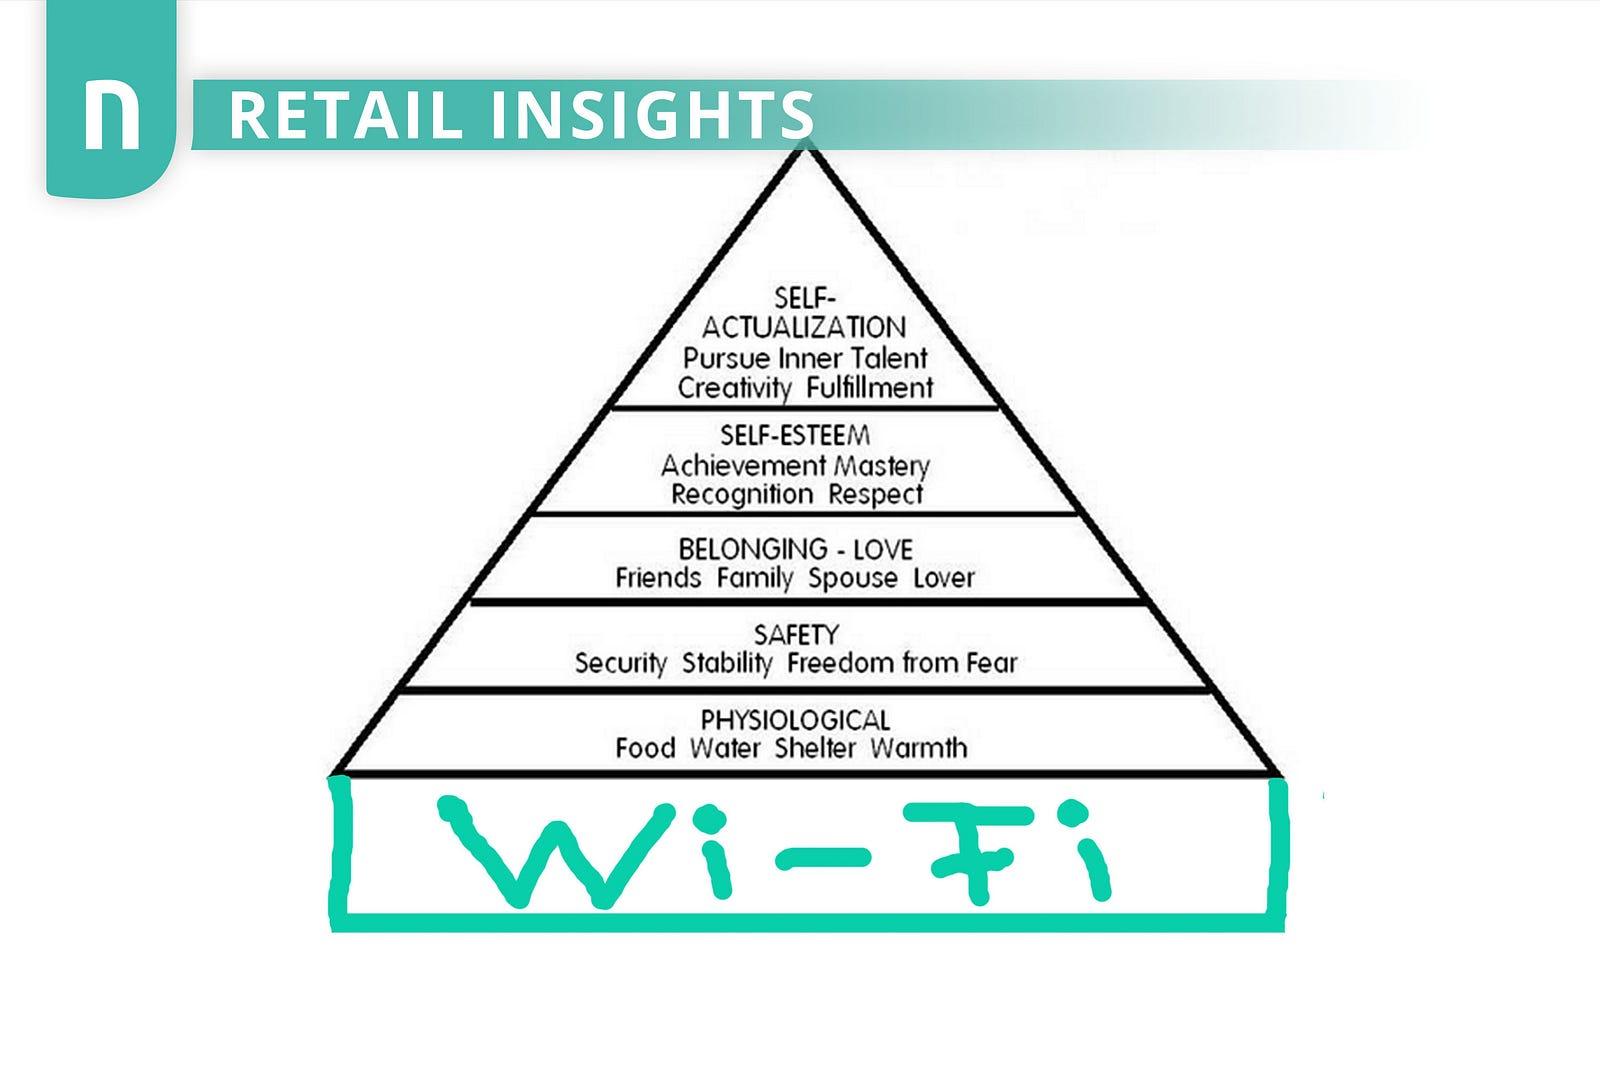 Wi Fi The New Basis Of Maslow S Pyramid Of Human Needs